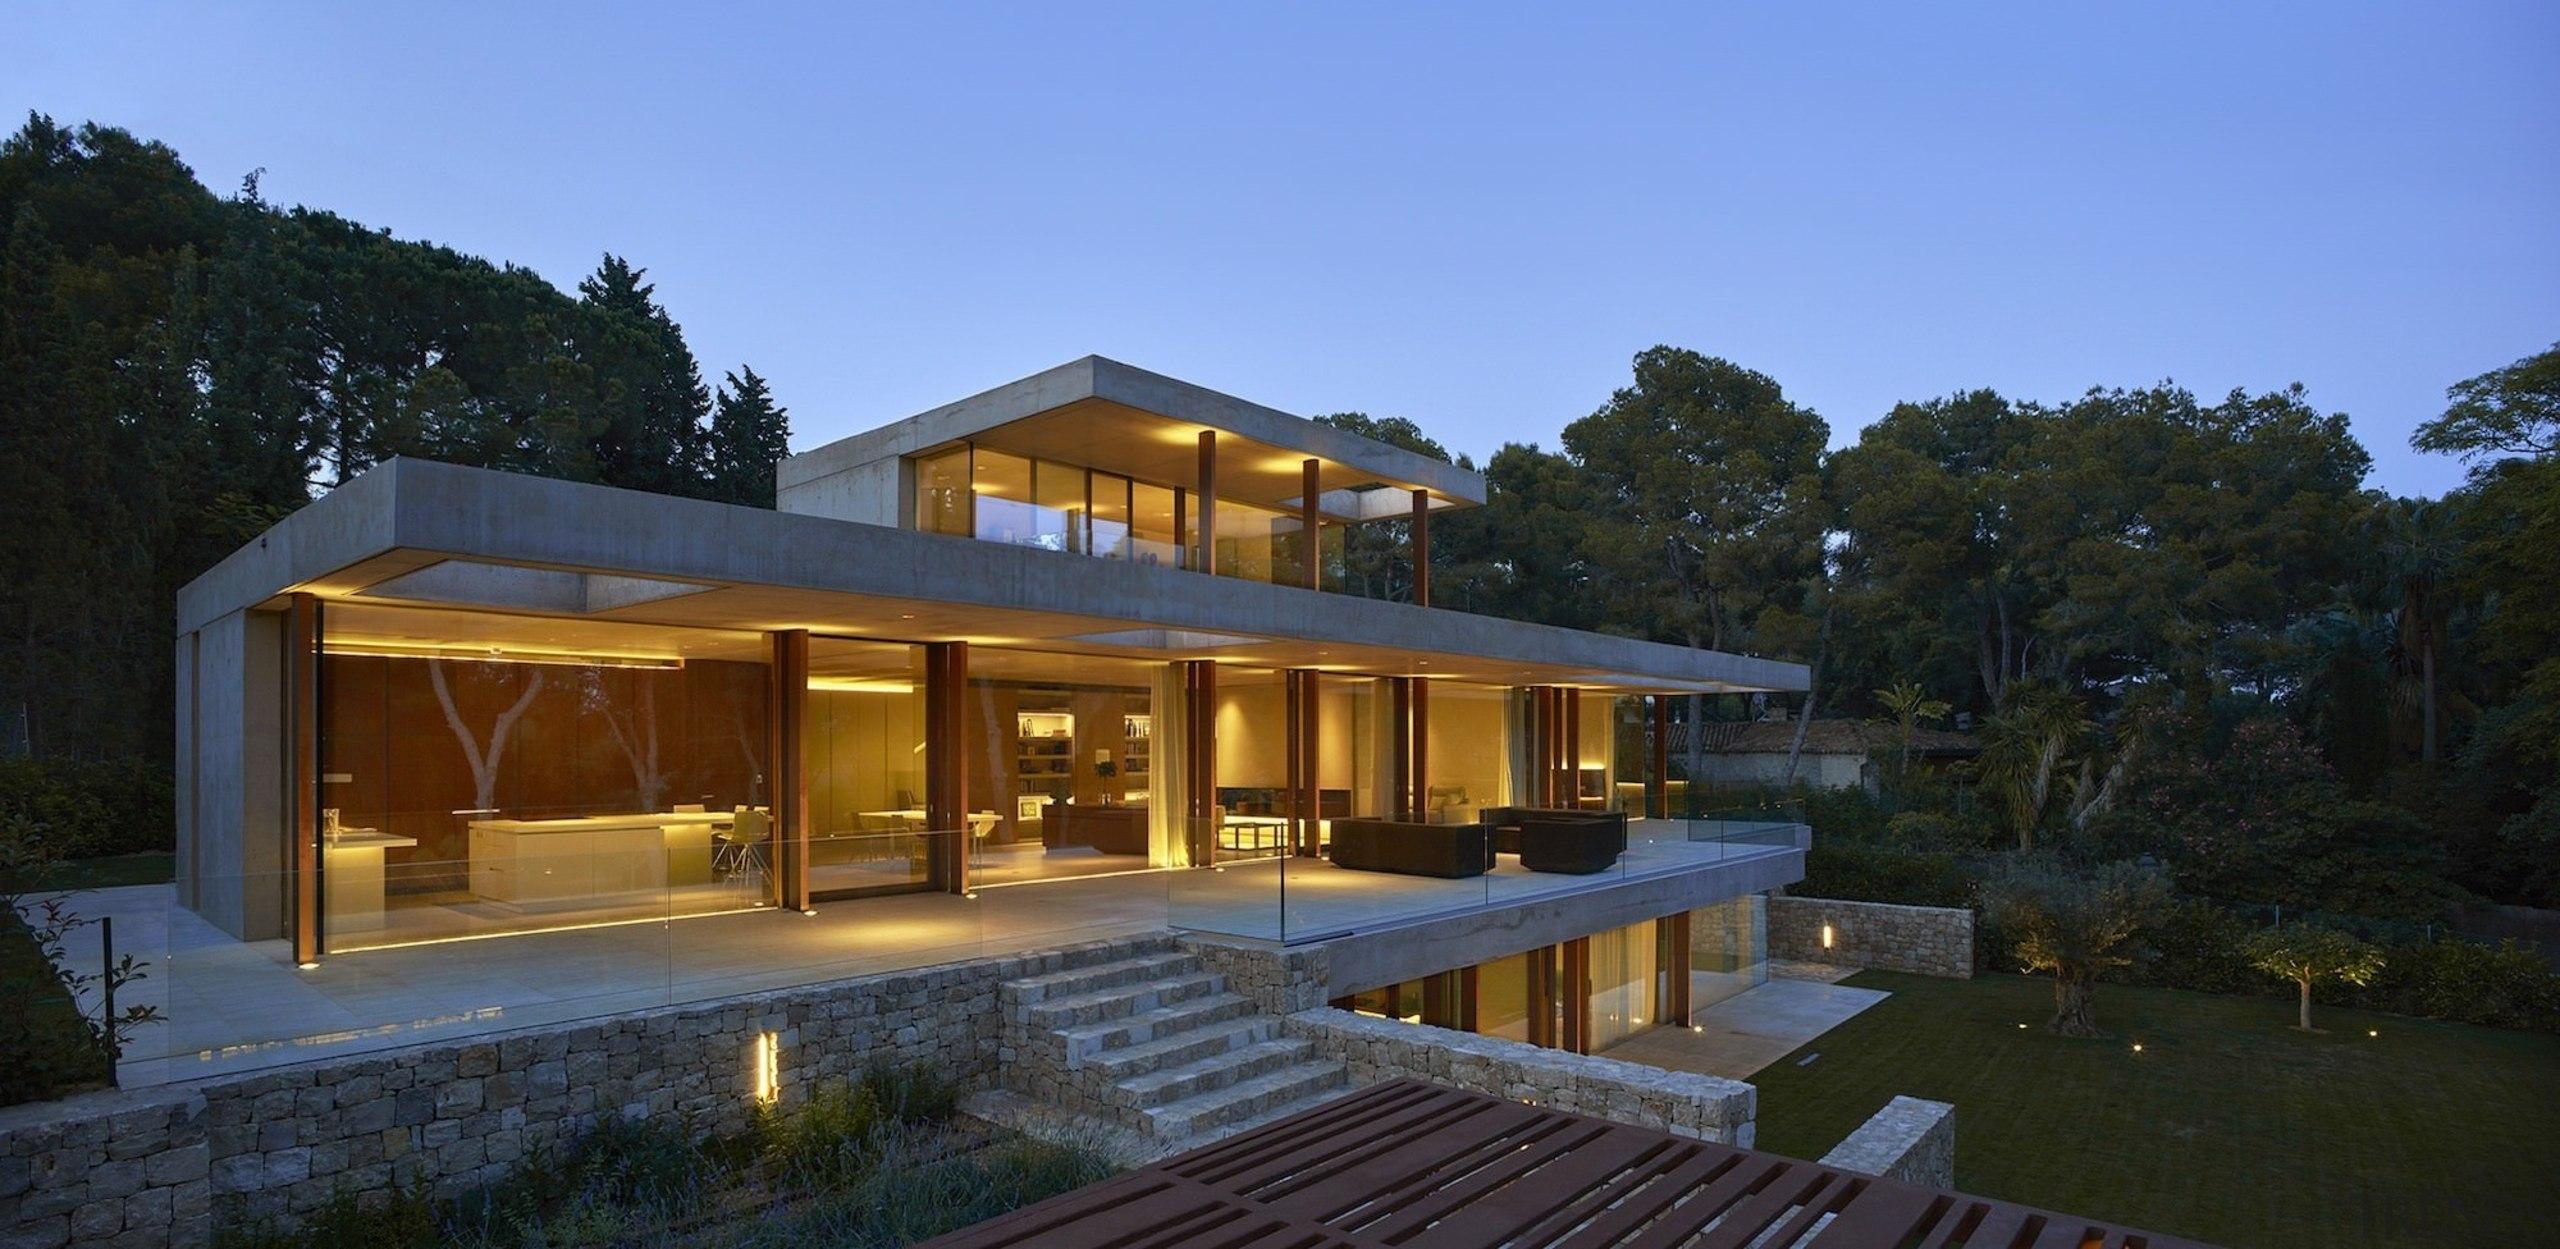 Architect: Ramón Esteve Estudio de Arquitectura architecture, cottage, estate, facade, farmhouse, home, house, lighting, property, real estate, roof, villa, black, teal